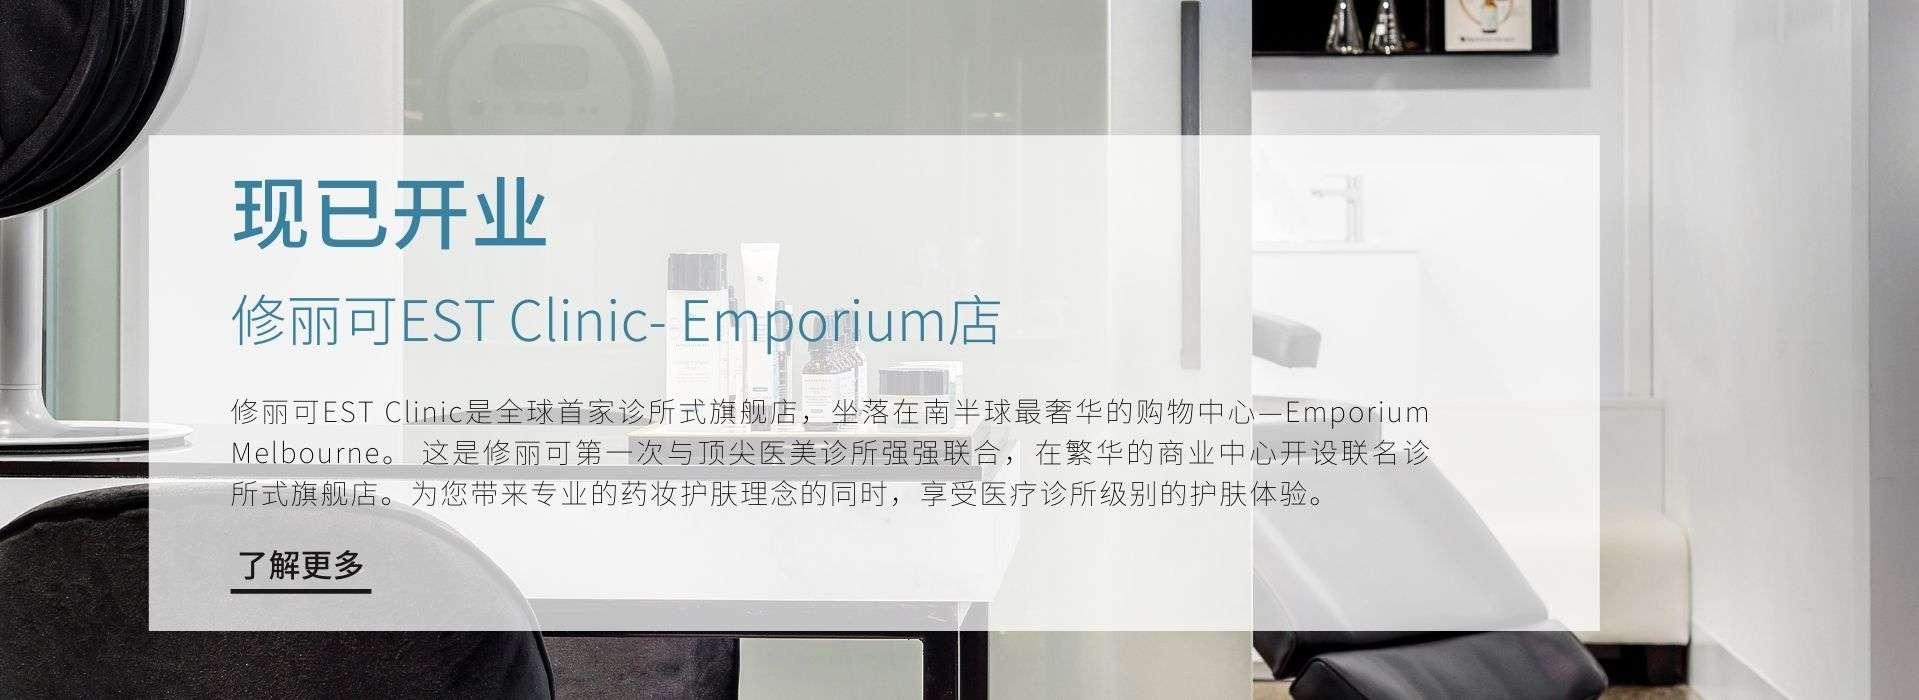 skinceuticals estclinic at melbourne